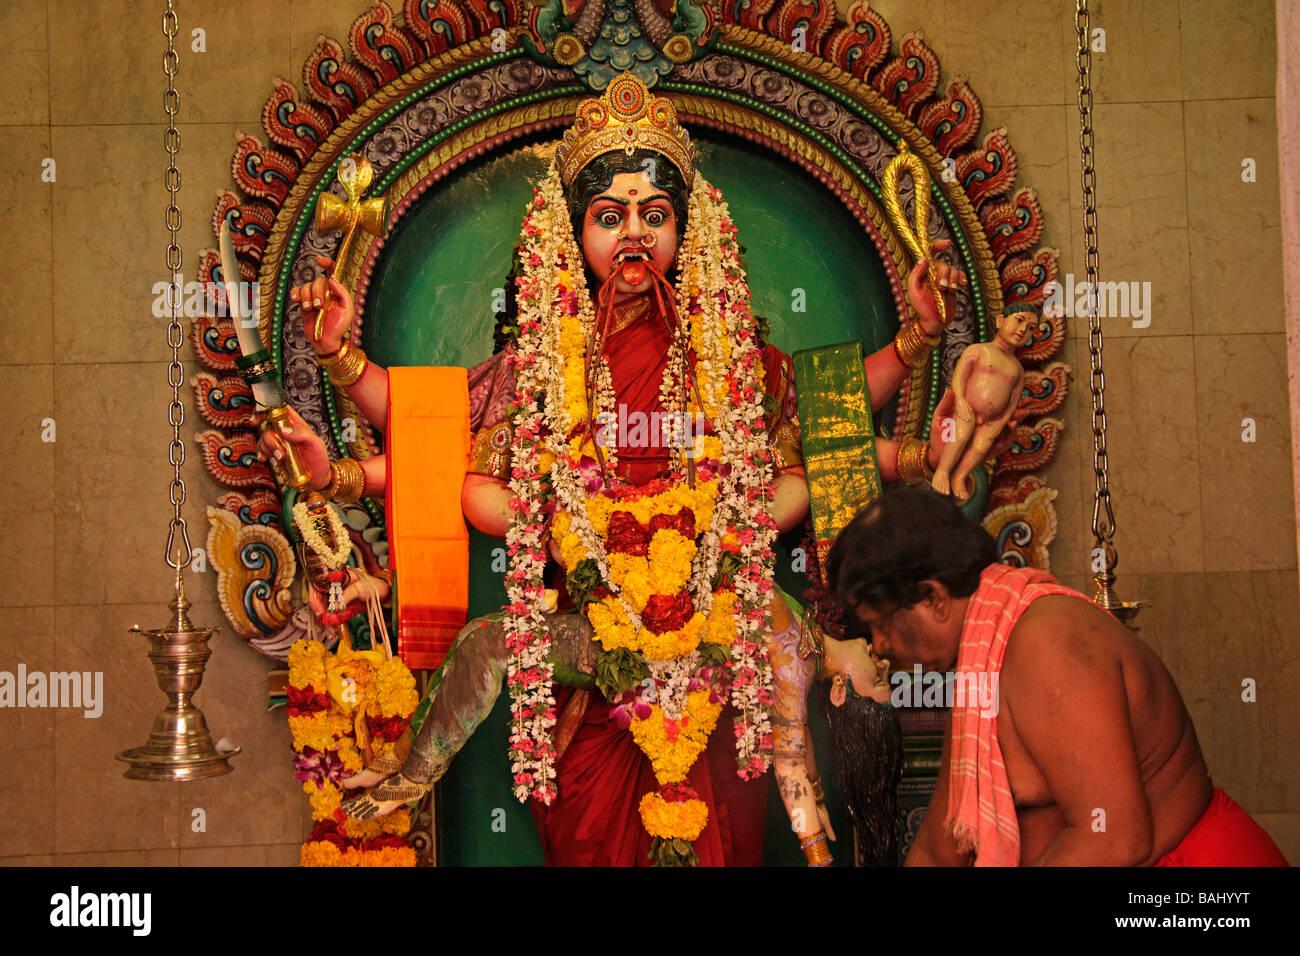 Hindu priest during a ceremony inside the Sri Veeramakali ...